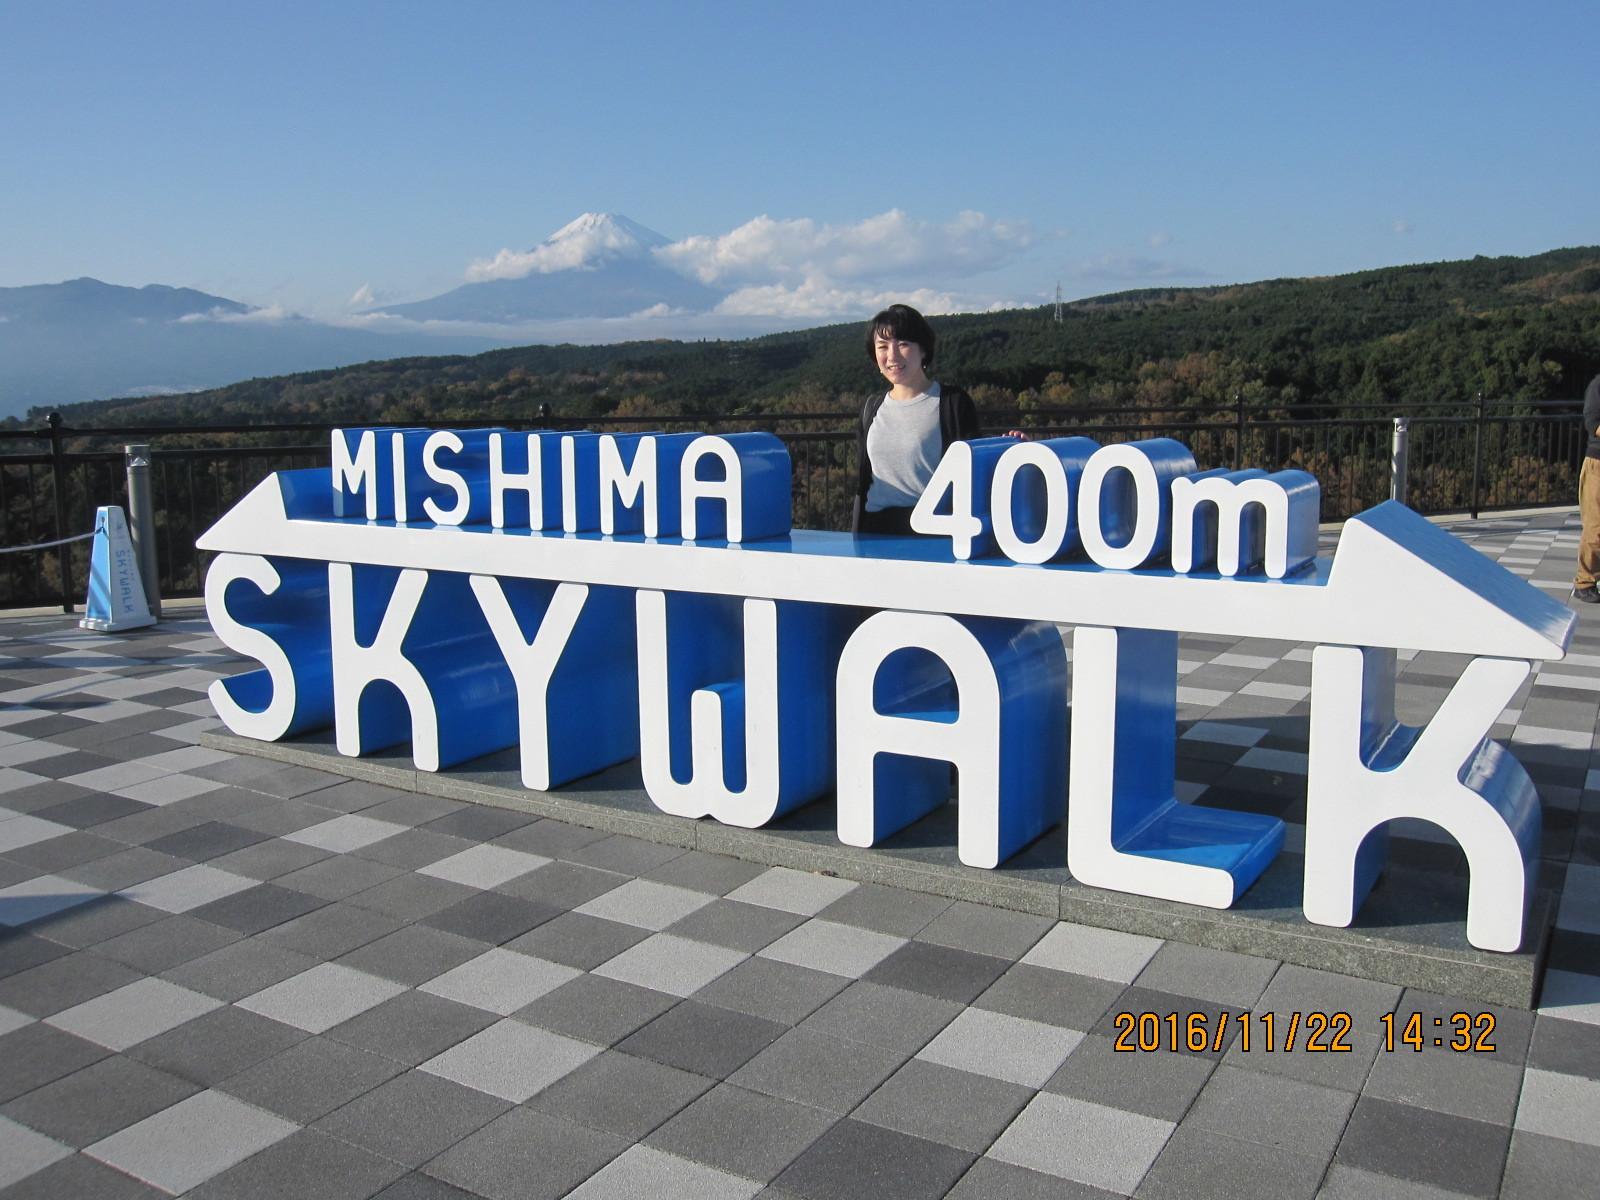 沼津御用邸記念公園〜沼津倶楽部〜日本最長400mの三島大吊橋で富士山を望む_1_6-1